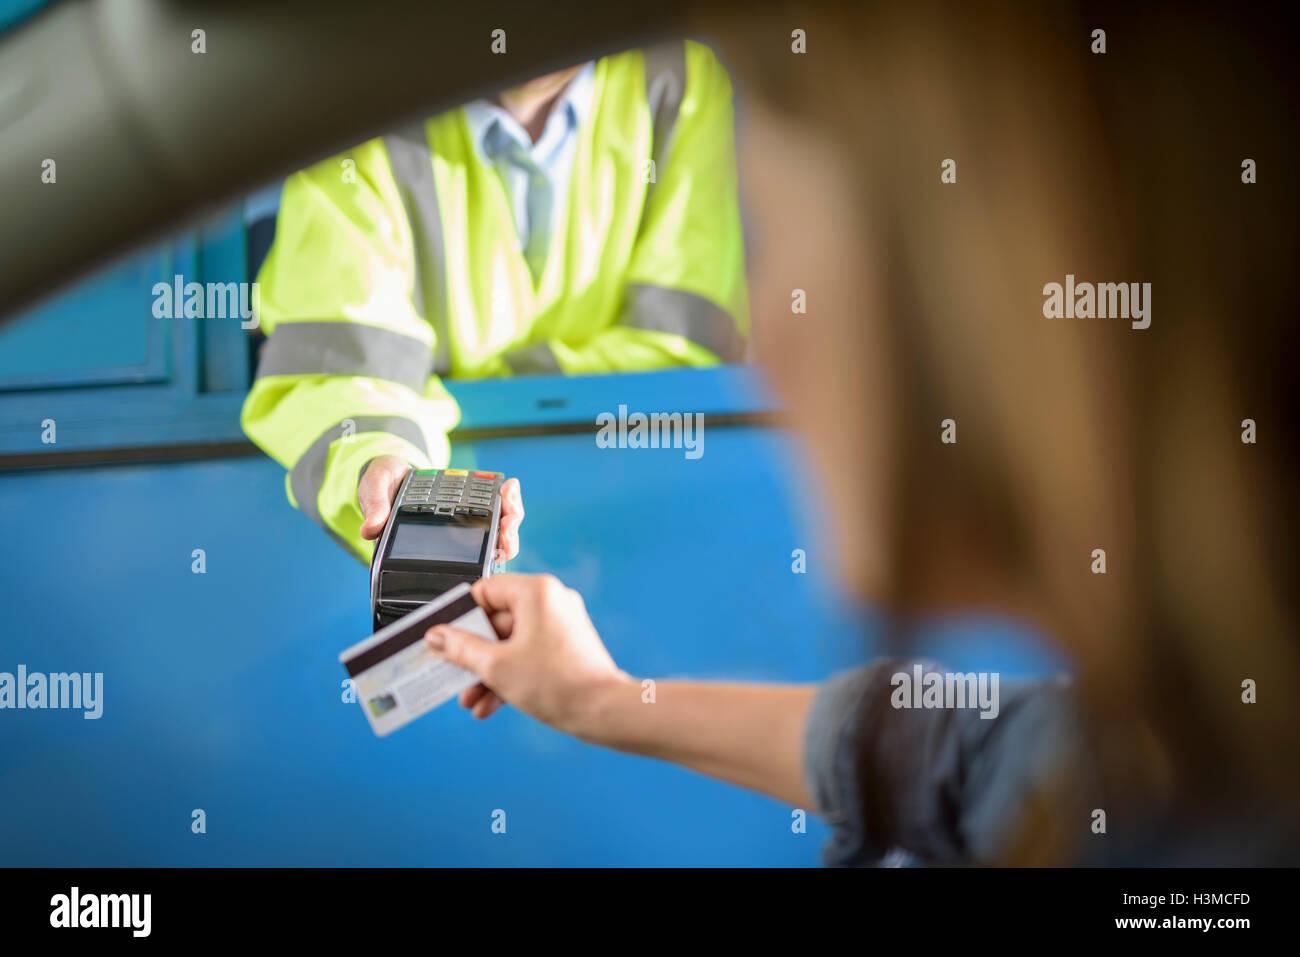 Fahrer im Auto zahlenden Mautstelle mit kontaktlosen Karte Zahlungstechnologie, Nahaufnahme Stockbild